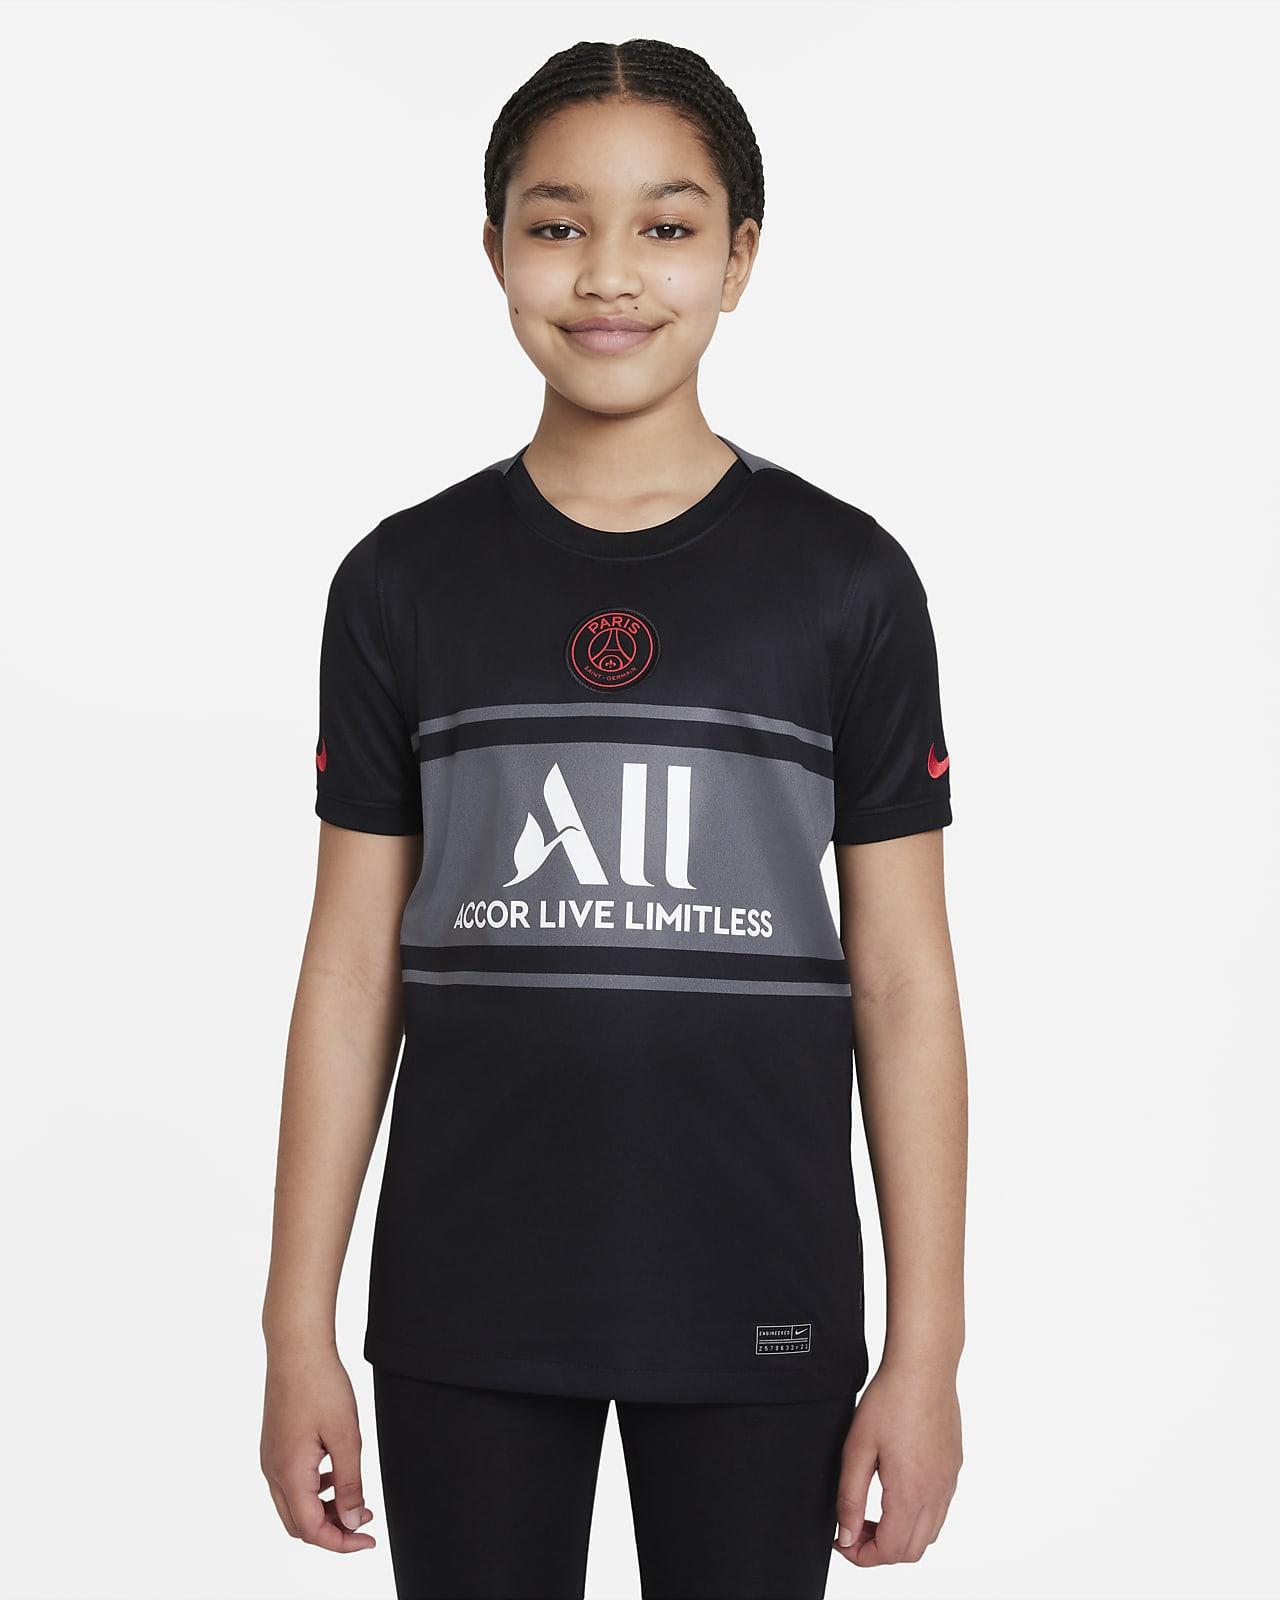 Jersey de fútbol Dri-FIT Nike del Paris Saint-Germain alternativo 2021/22 Stadium para niños talla grande